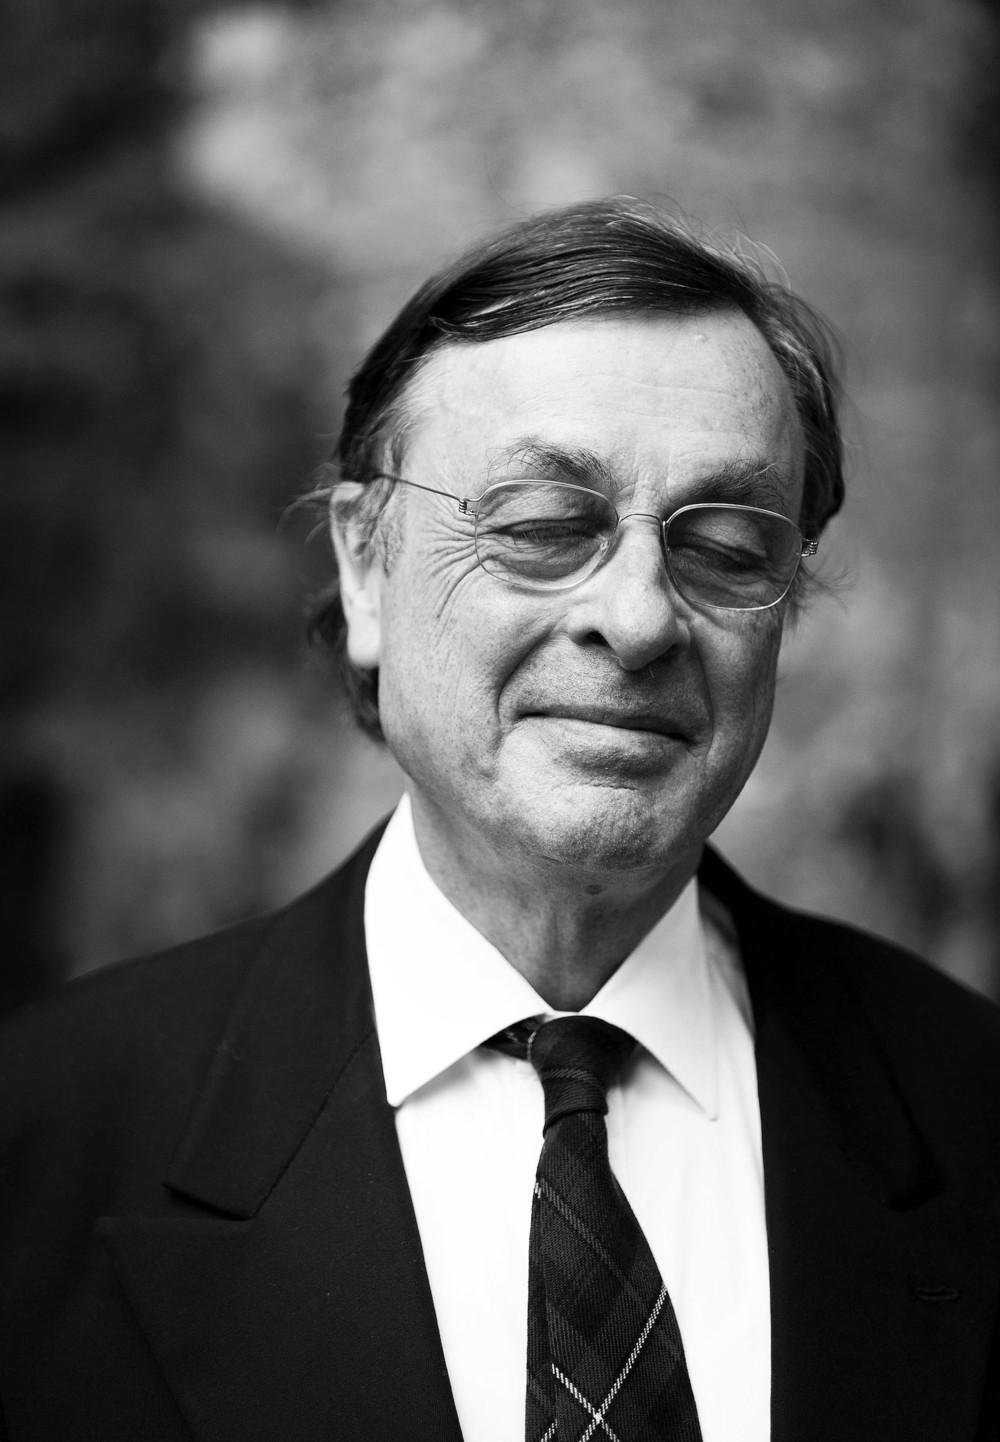 Eduard Brunner, Klarinettist, für Internationales Musikfest Kreuth, Kreuth, 2012